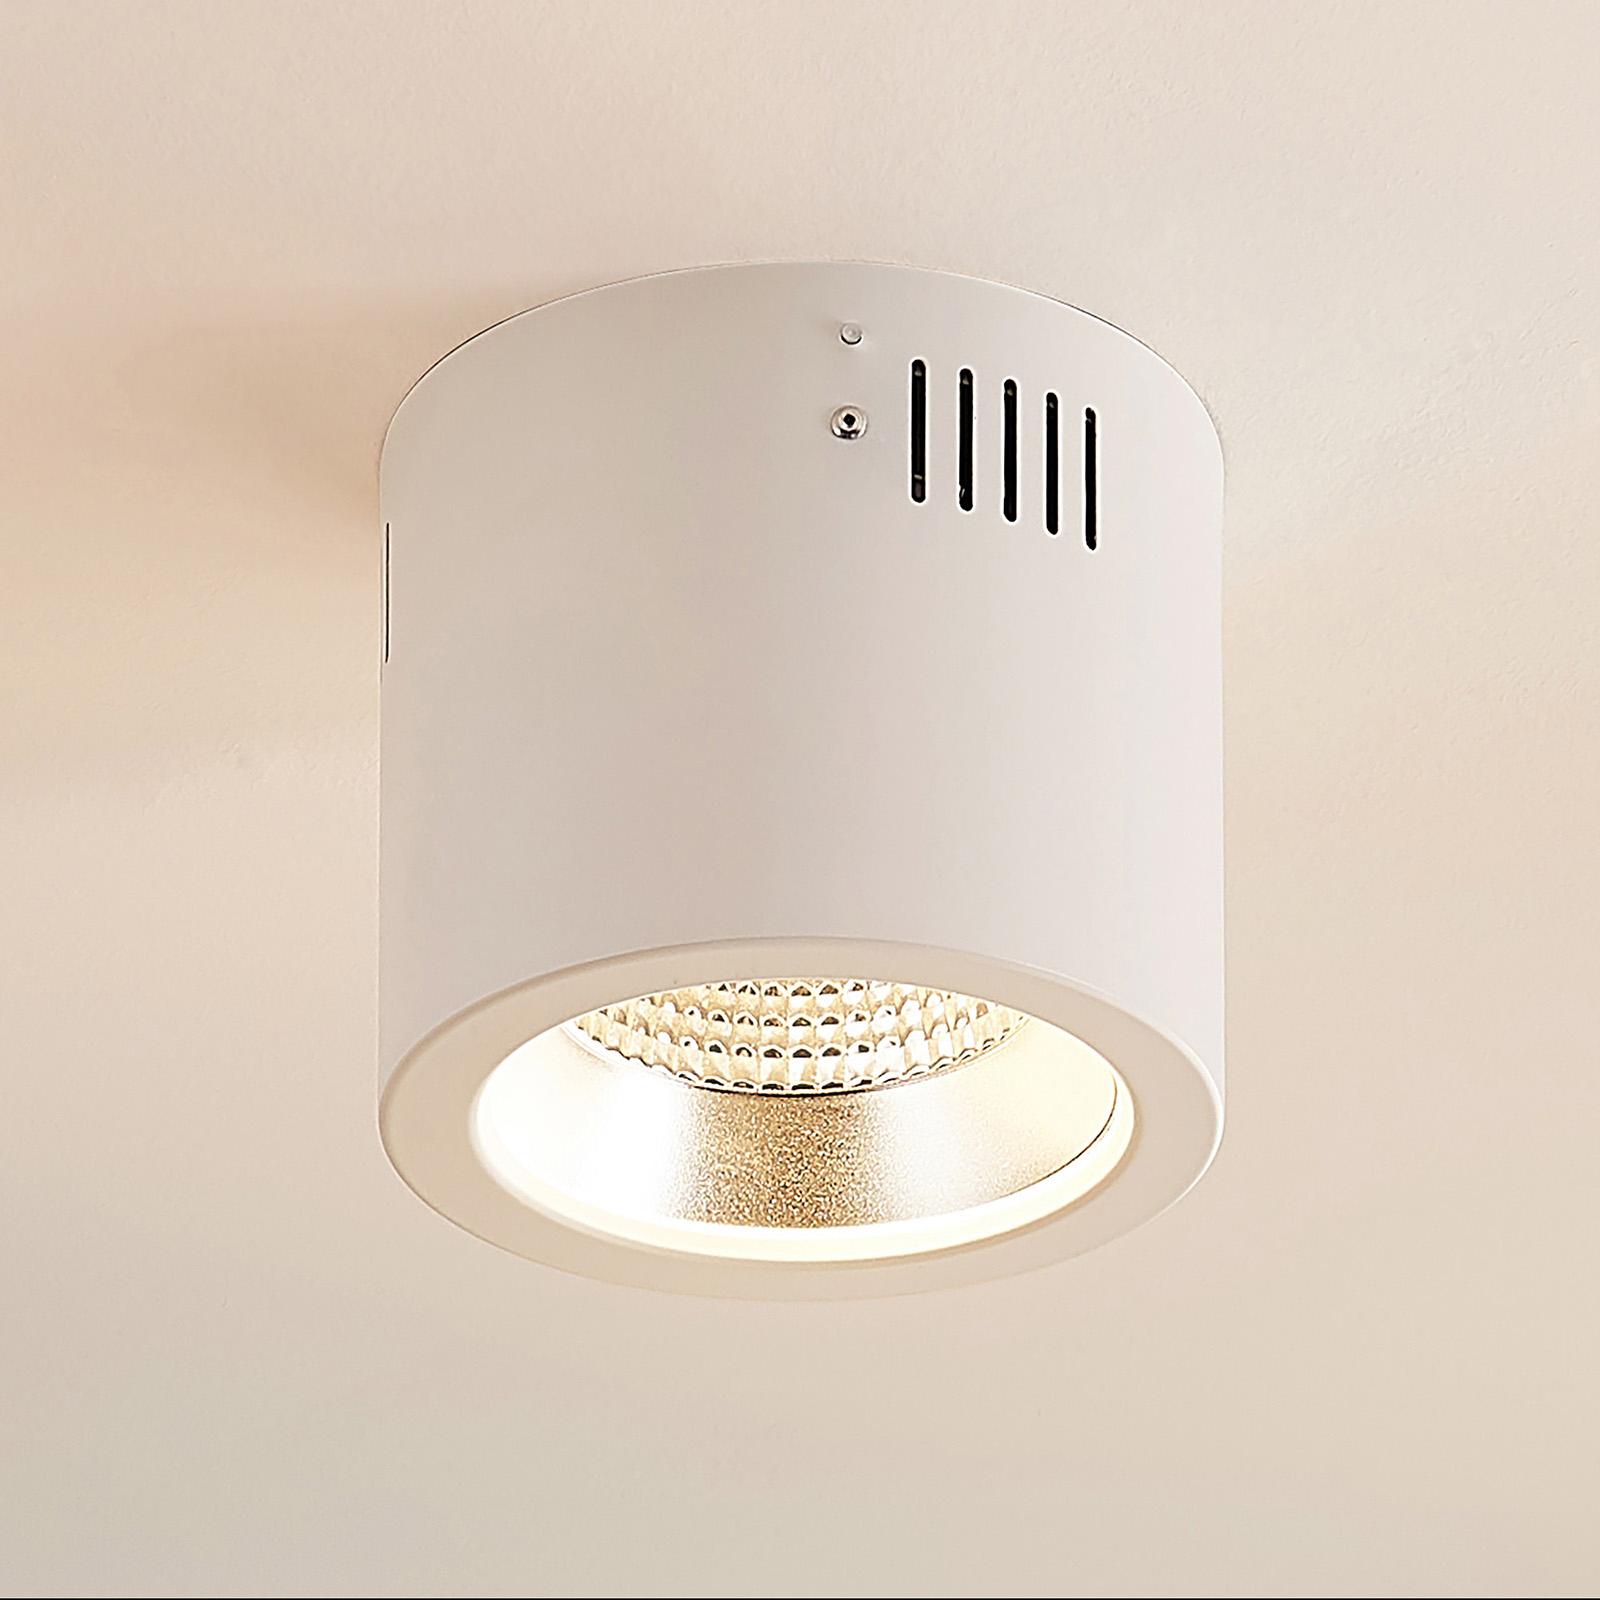 Arcchio Liddy LED downlight, wit, Ø 14,8 cm